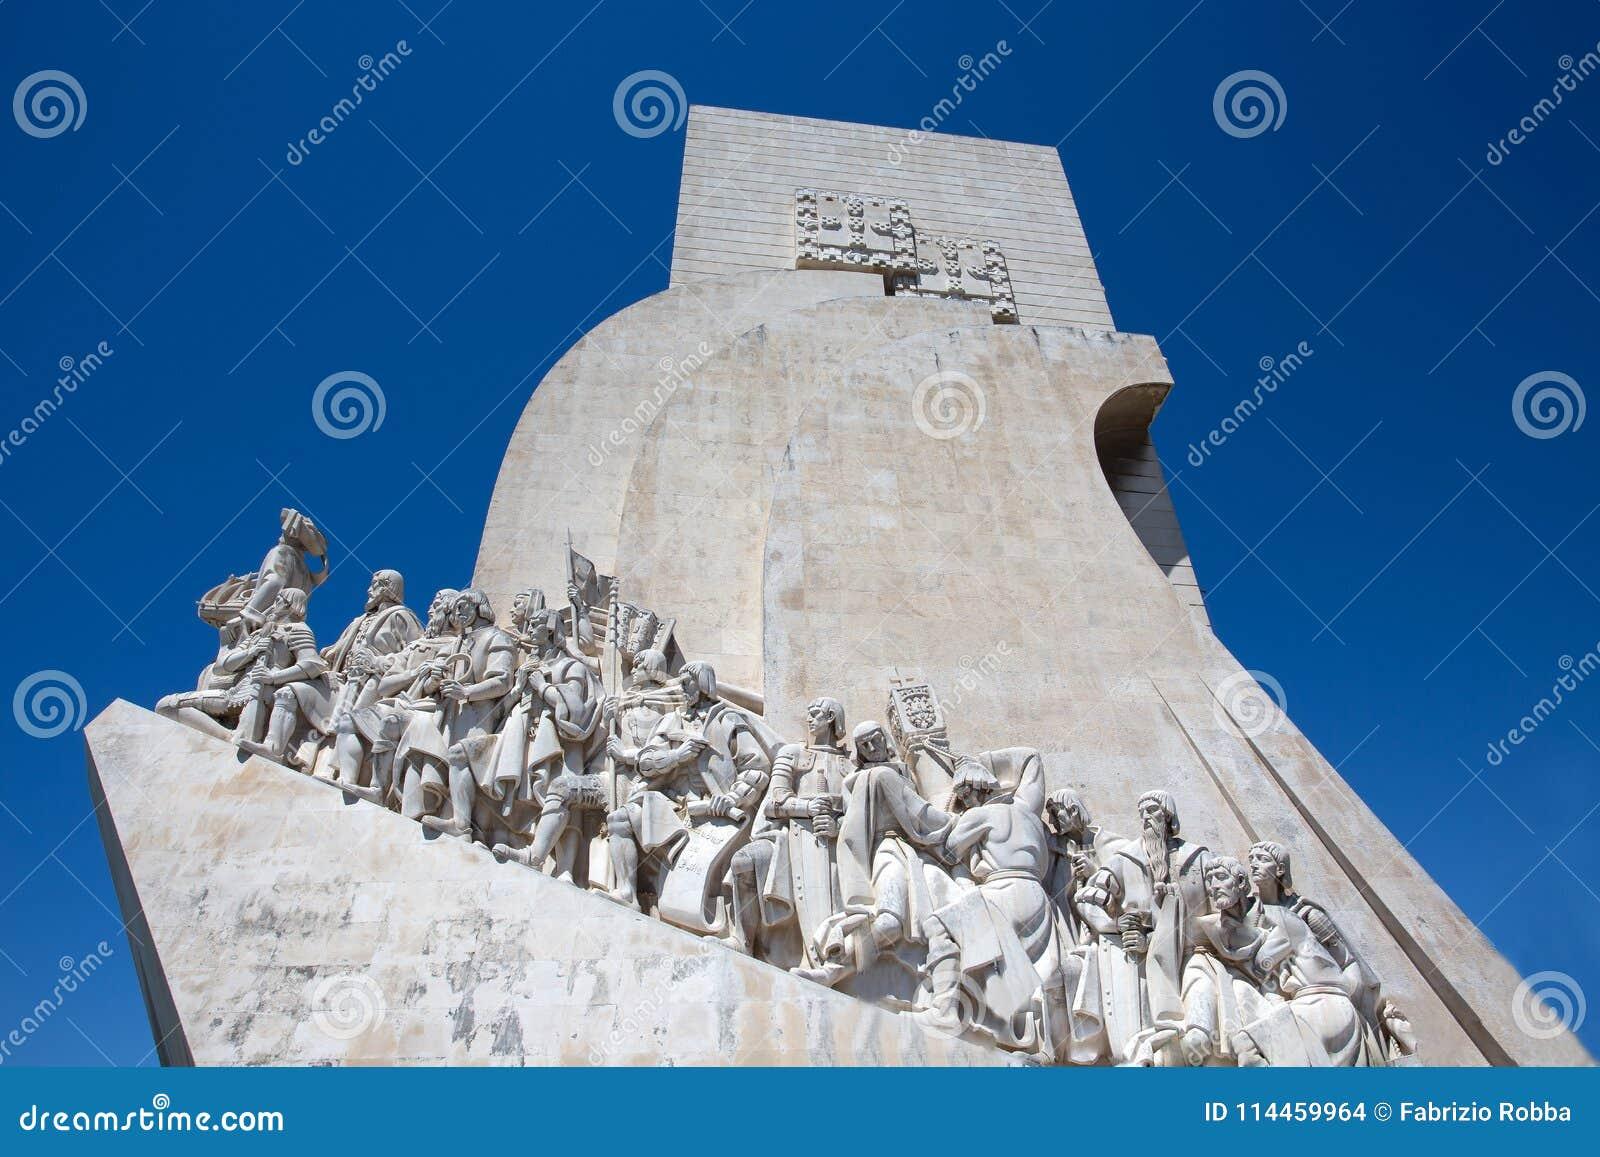 Das Monument zu den Entdeckungen, Lissabon, Portugal, Europa